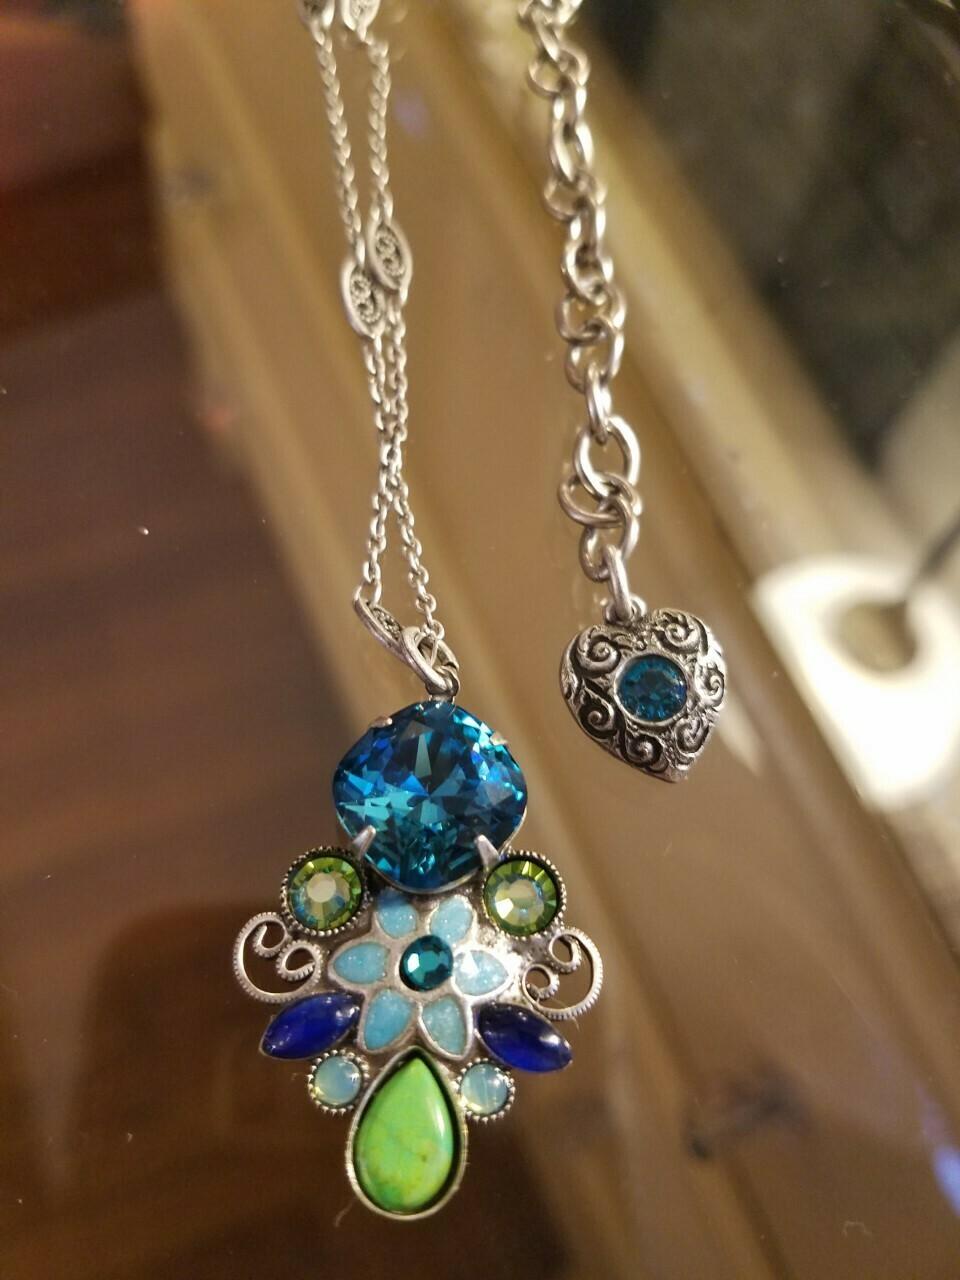 Bejeweled Floral Necklace